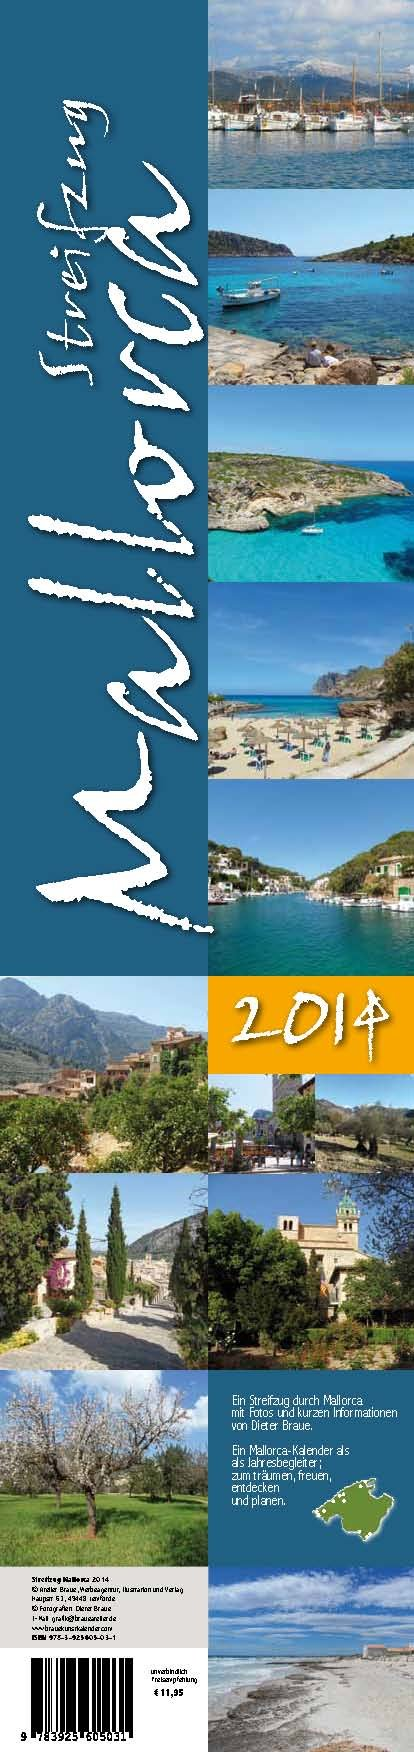 Streifzug Mallorca 2014: Fotostreifzug durch Mallorca mit Motivbeschreibungen. Streifenkalender: Streifenkalender 2014 zum Planen